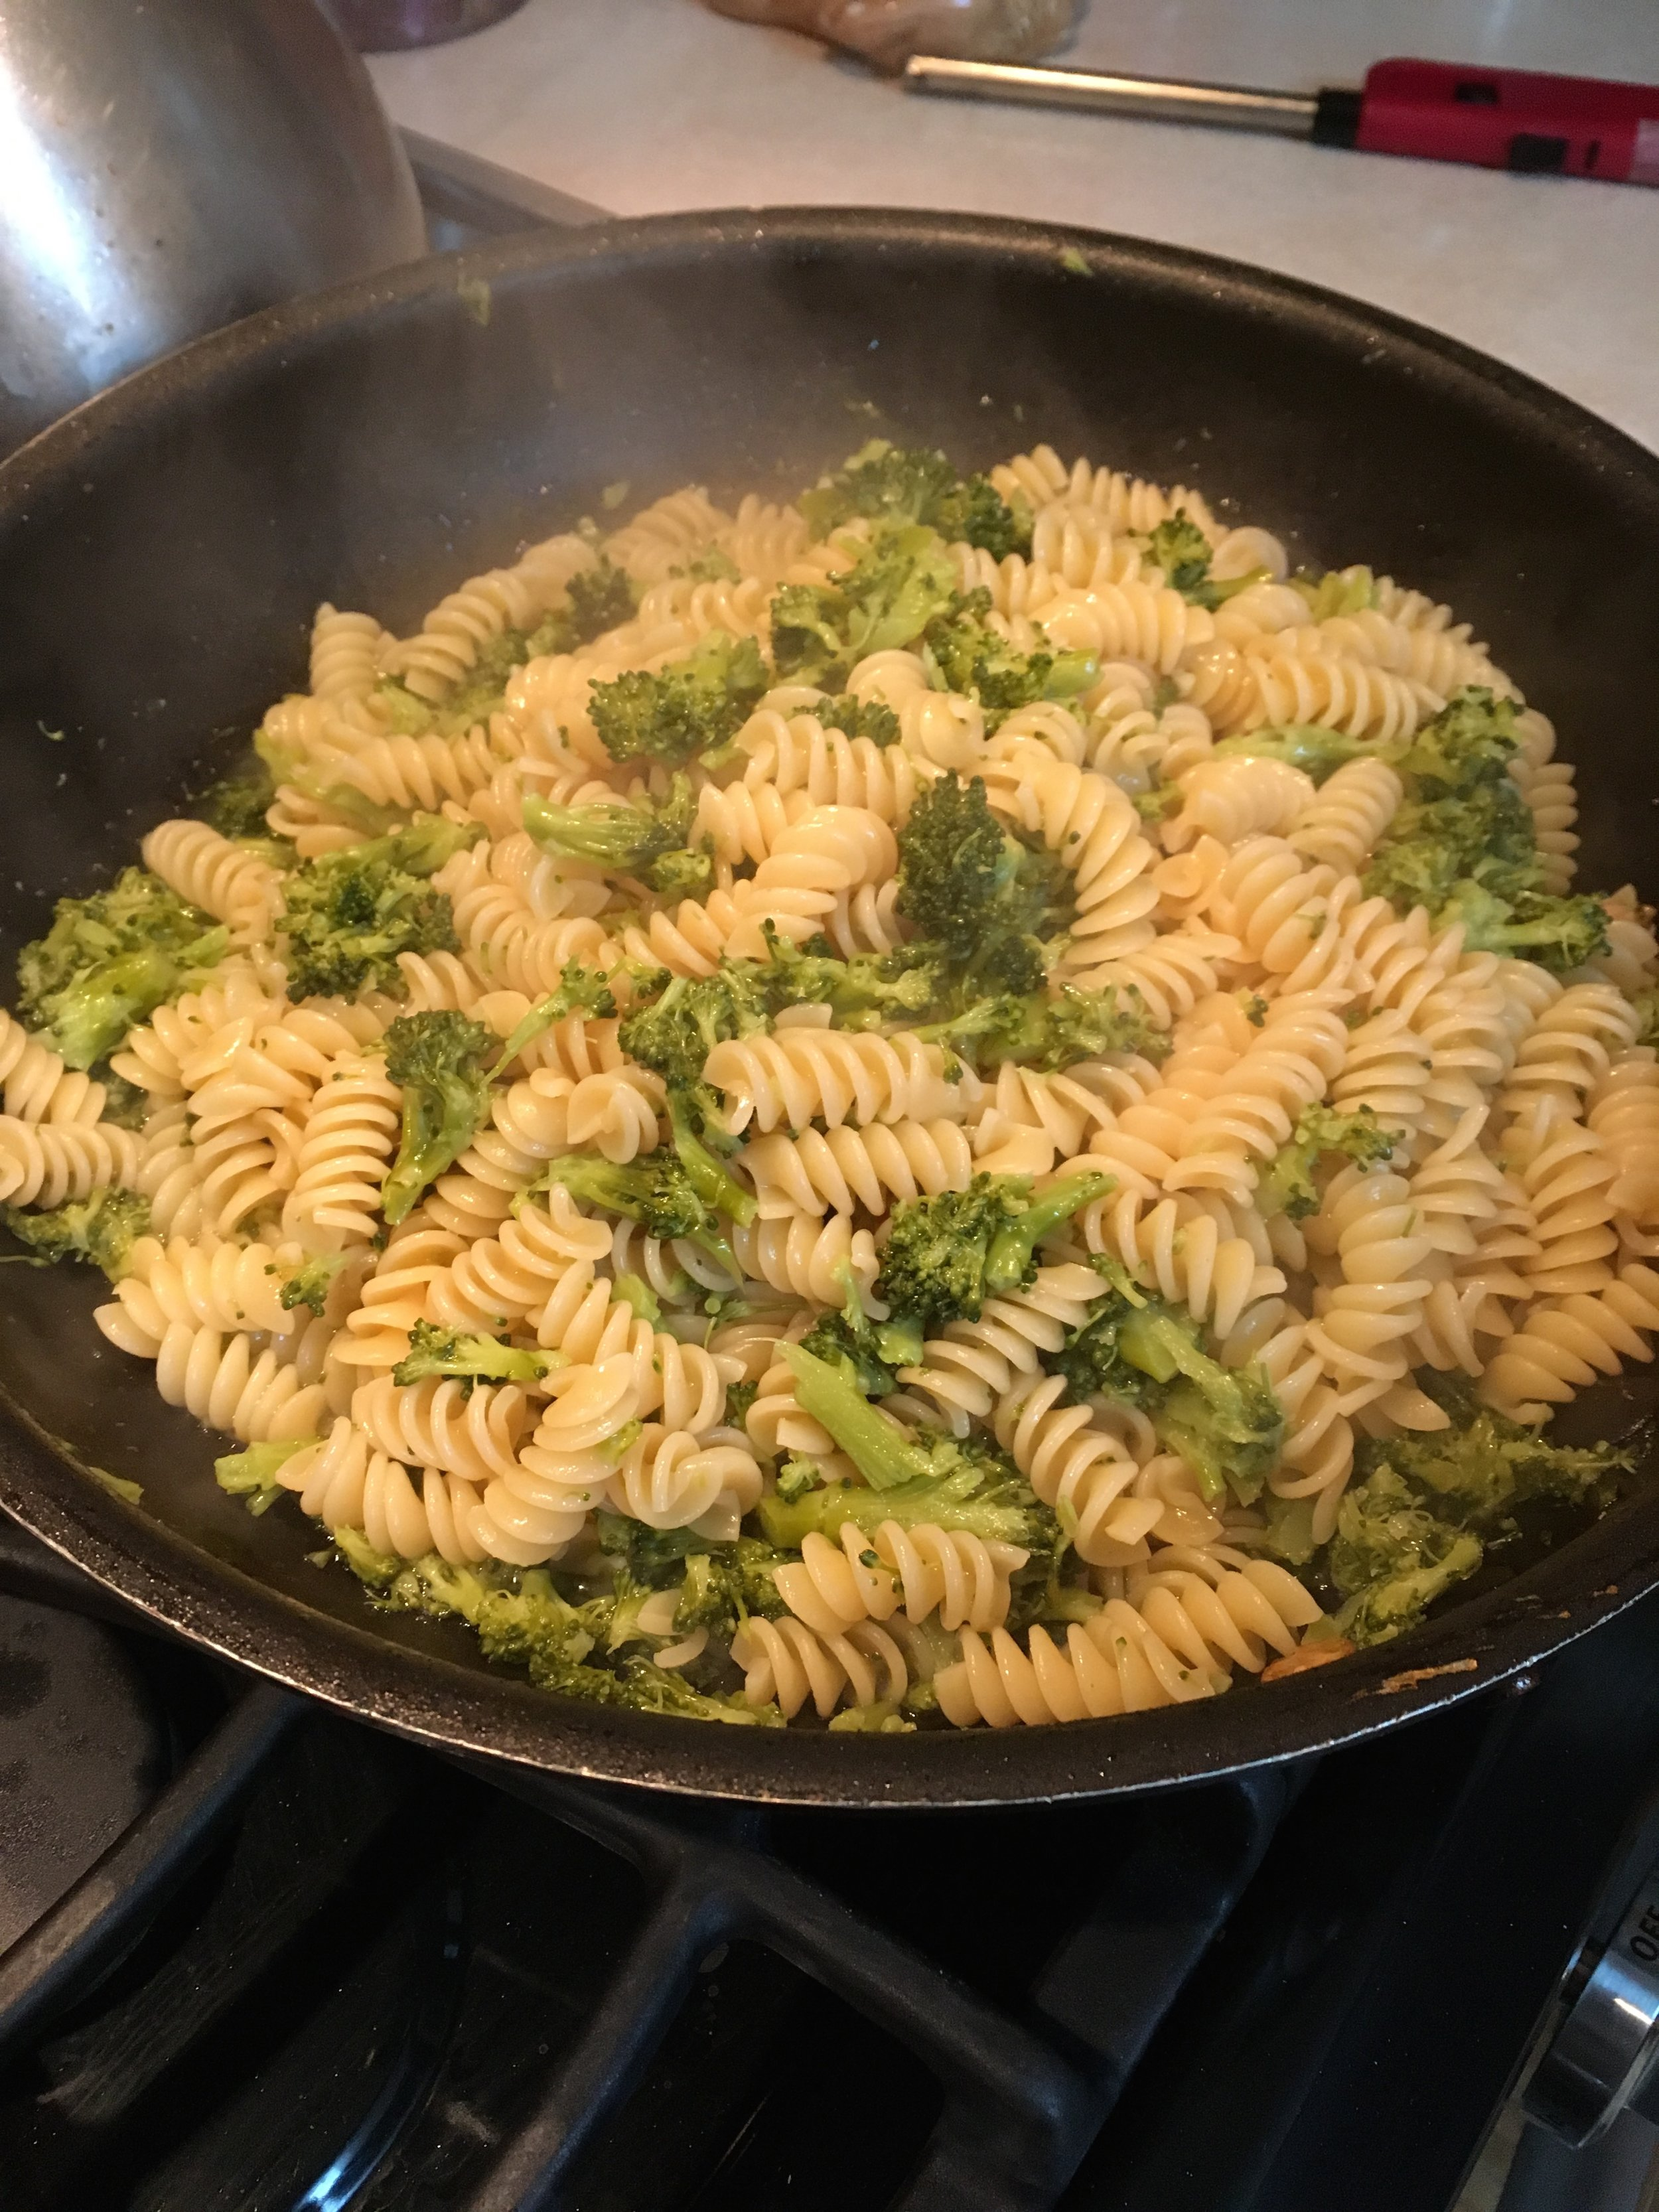 My dad's 'famous' broccoli pasta